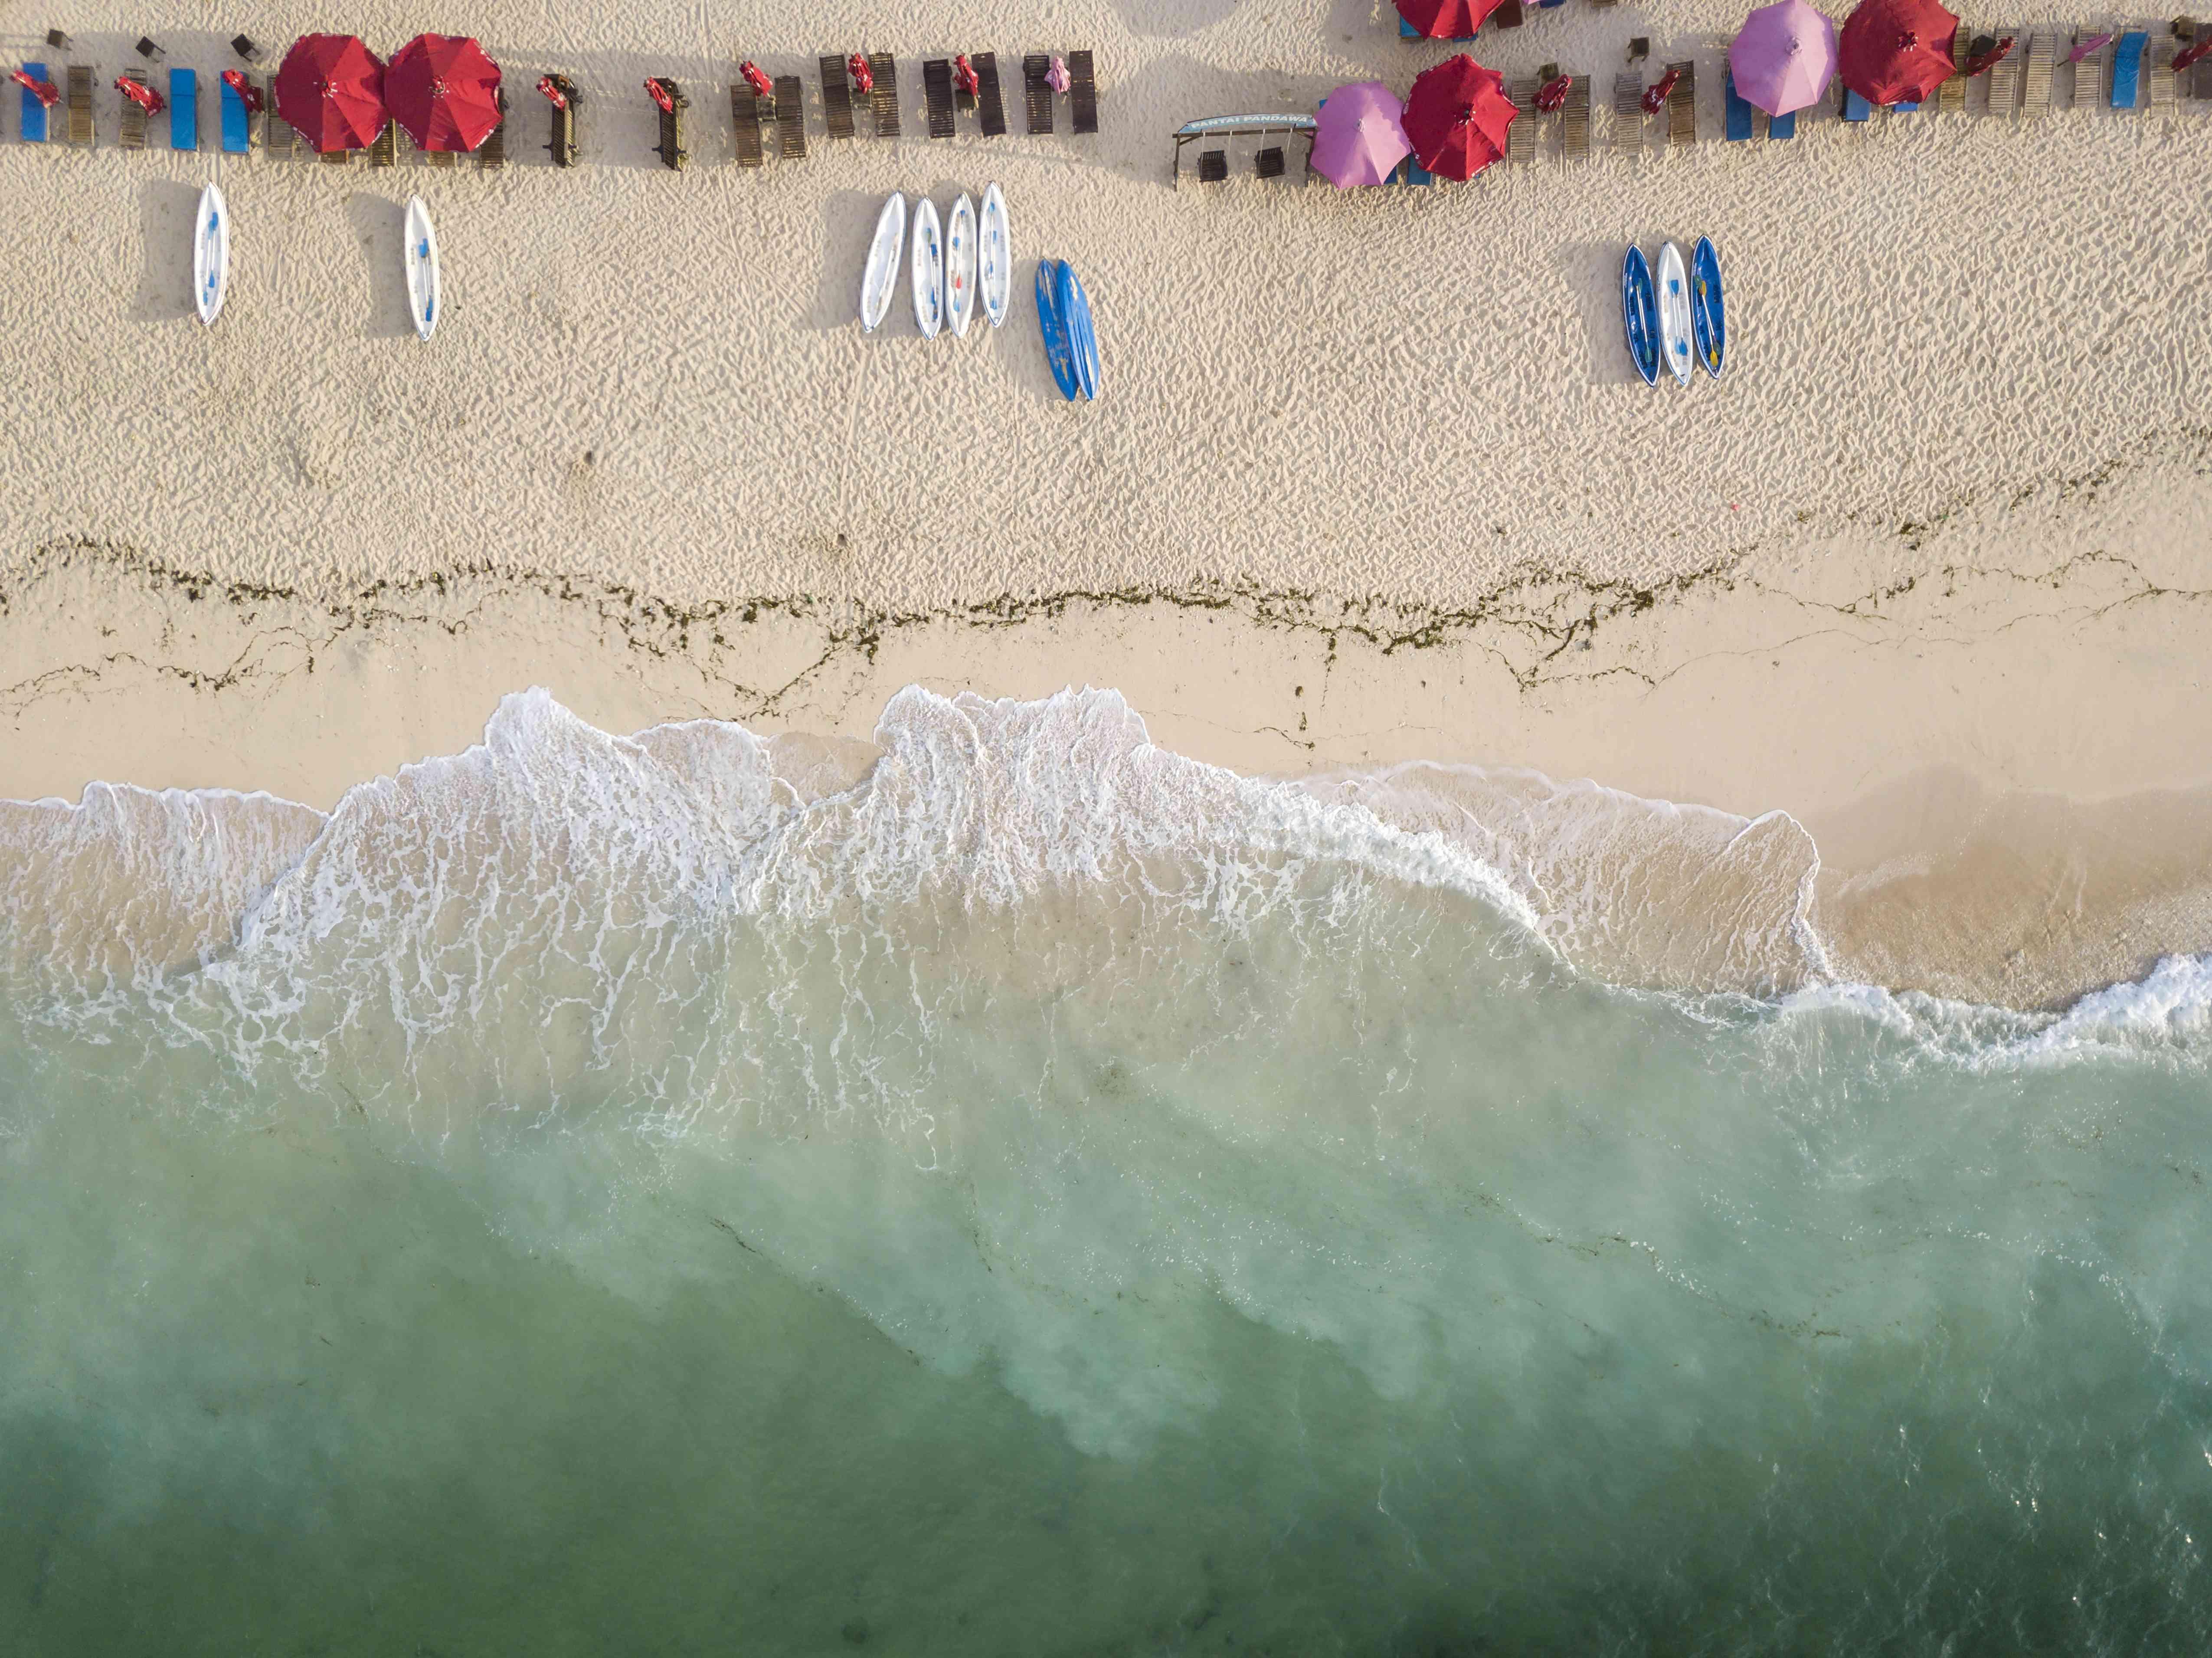 Indonesia, Bali, Aerial view of Pandawa beach